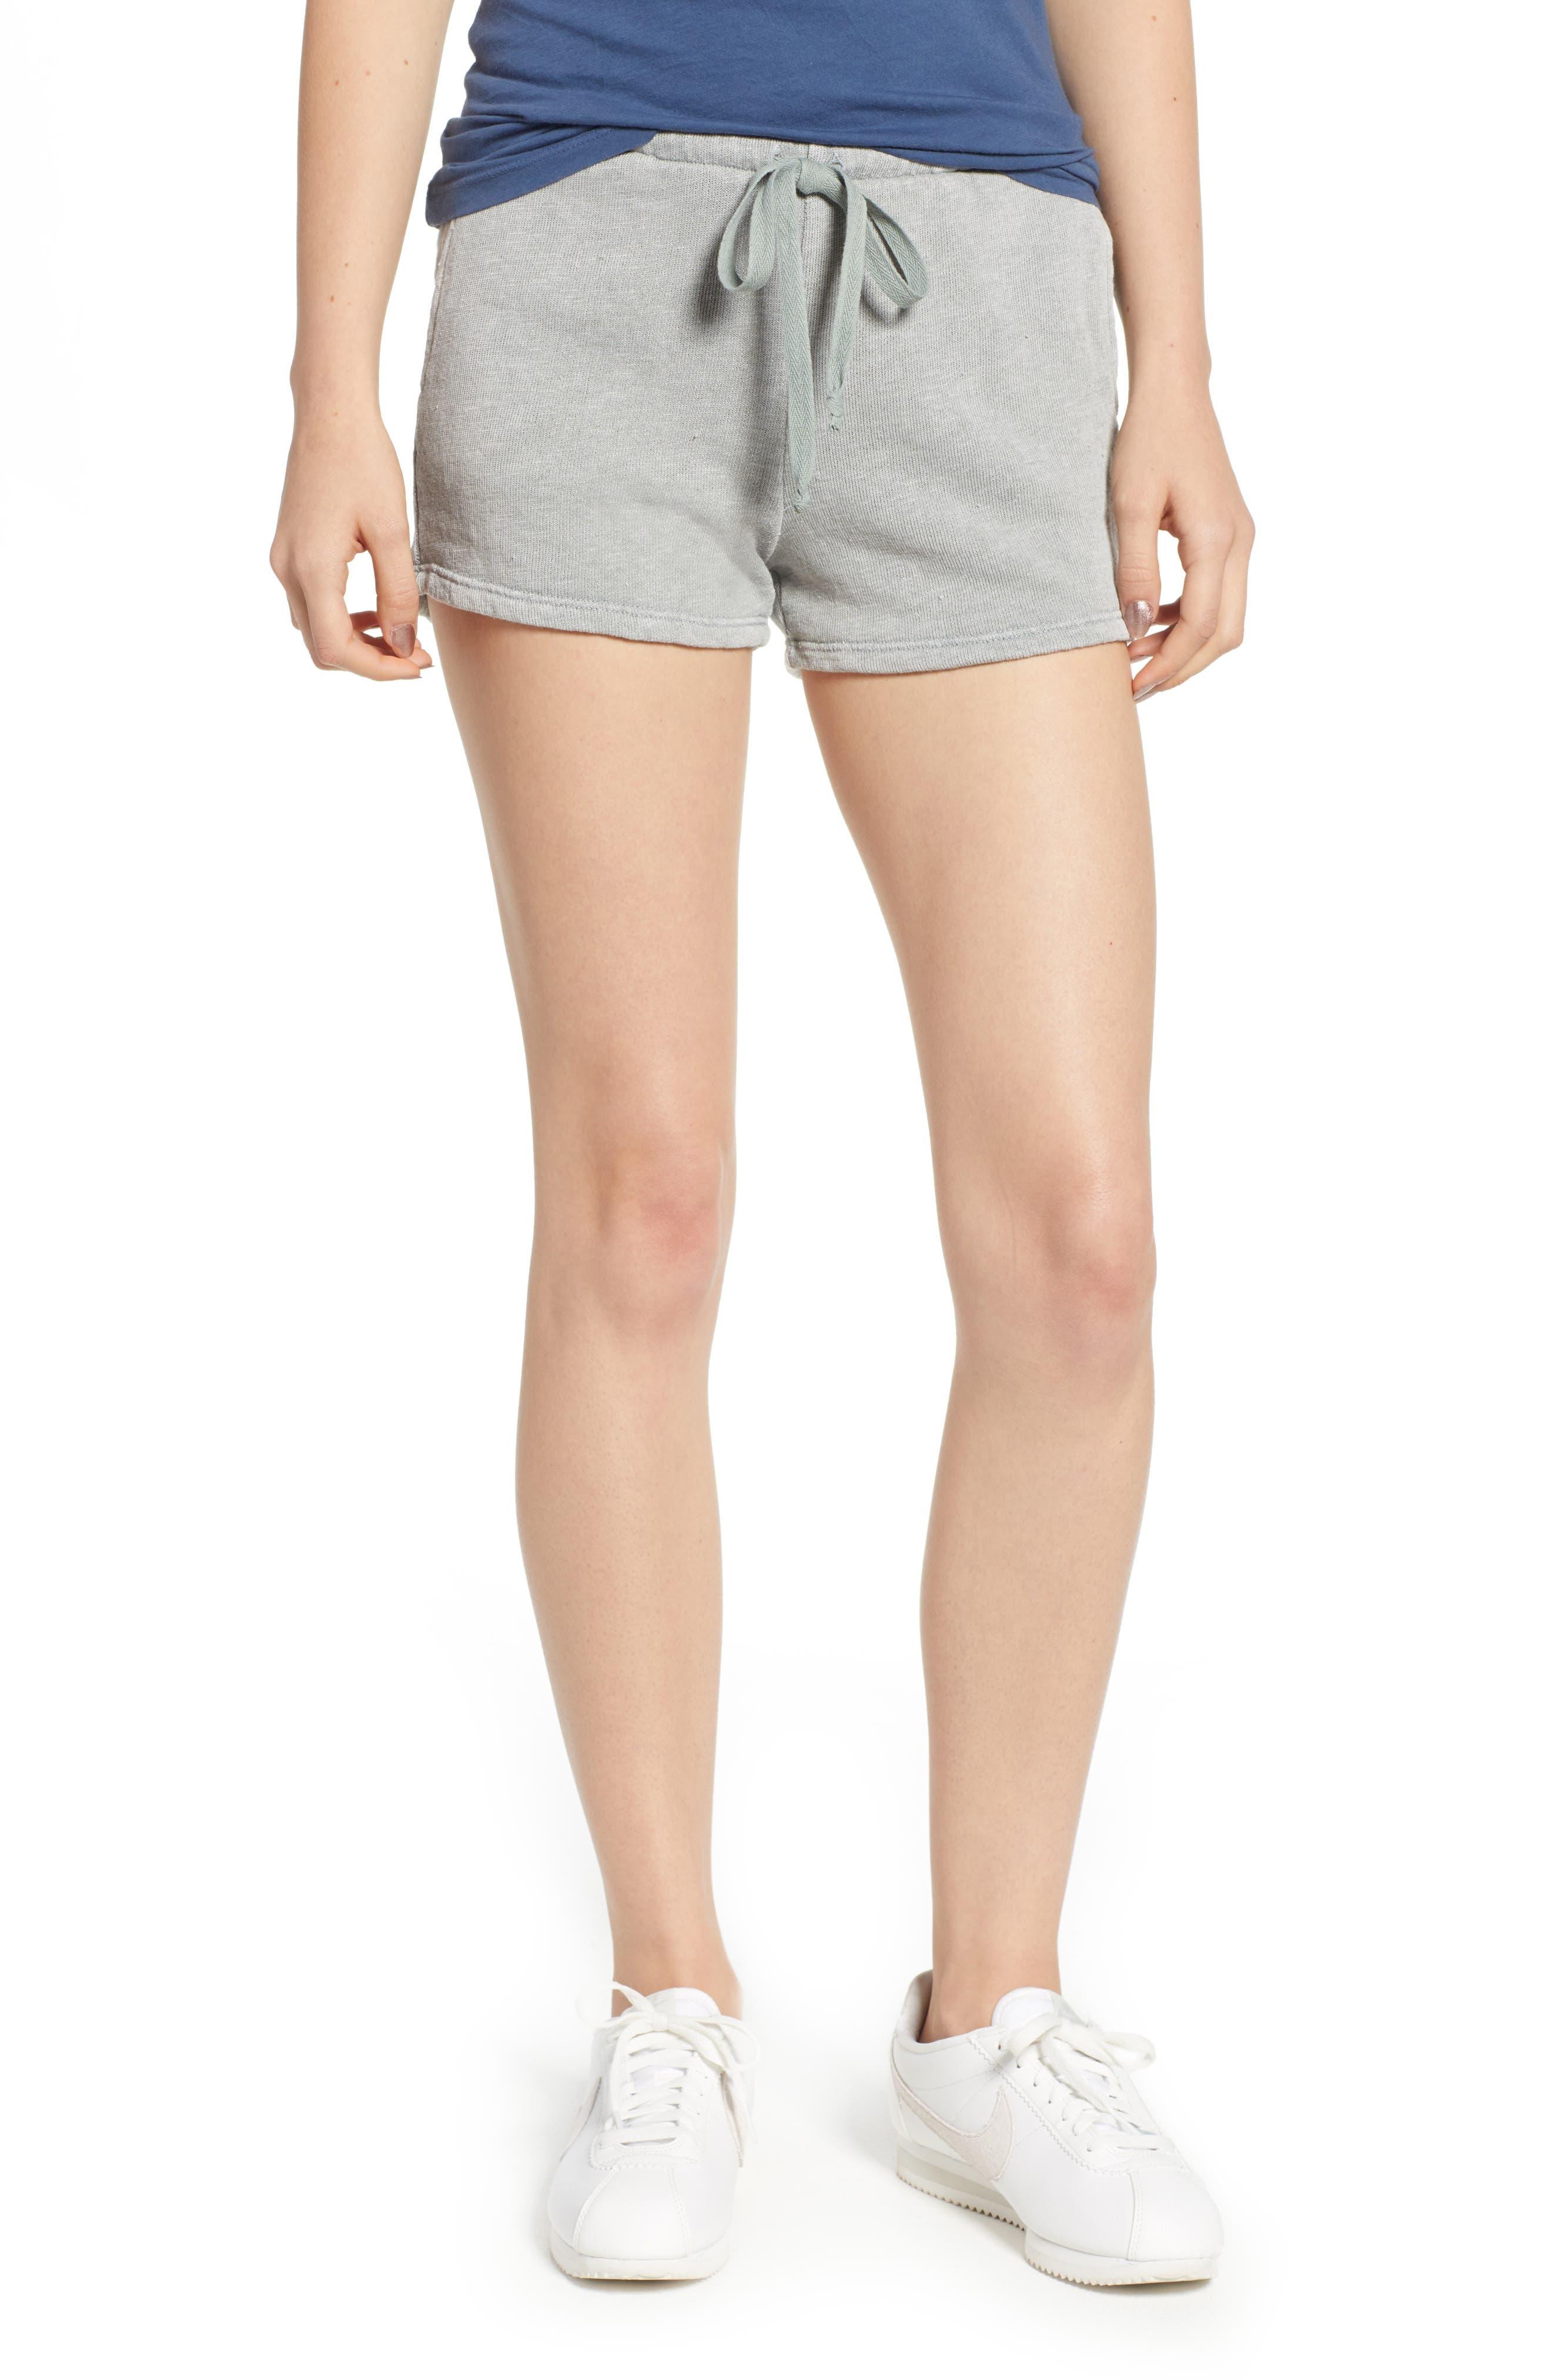 Kiama Shorts,                             Main thumbnail 1, color,                             FADED MOSS